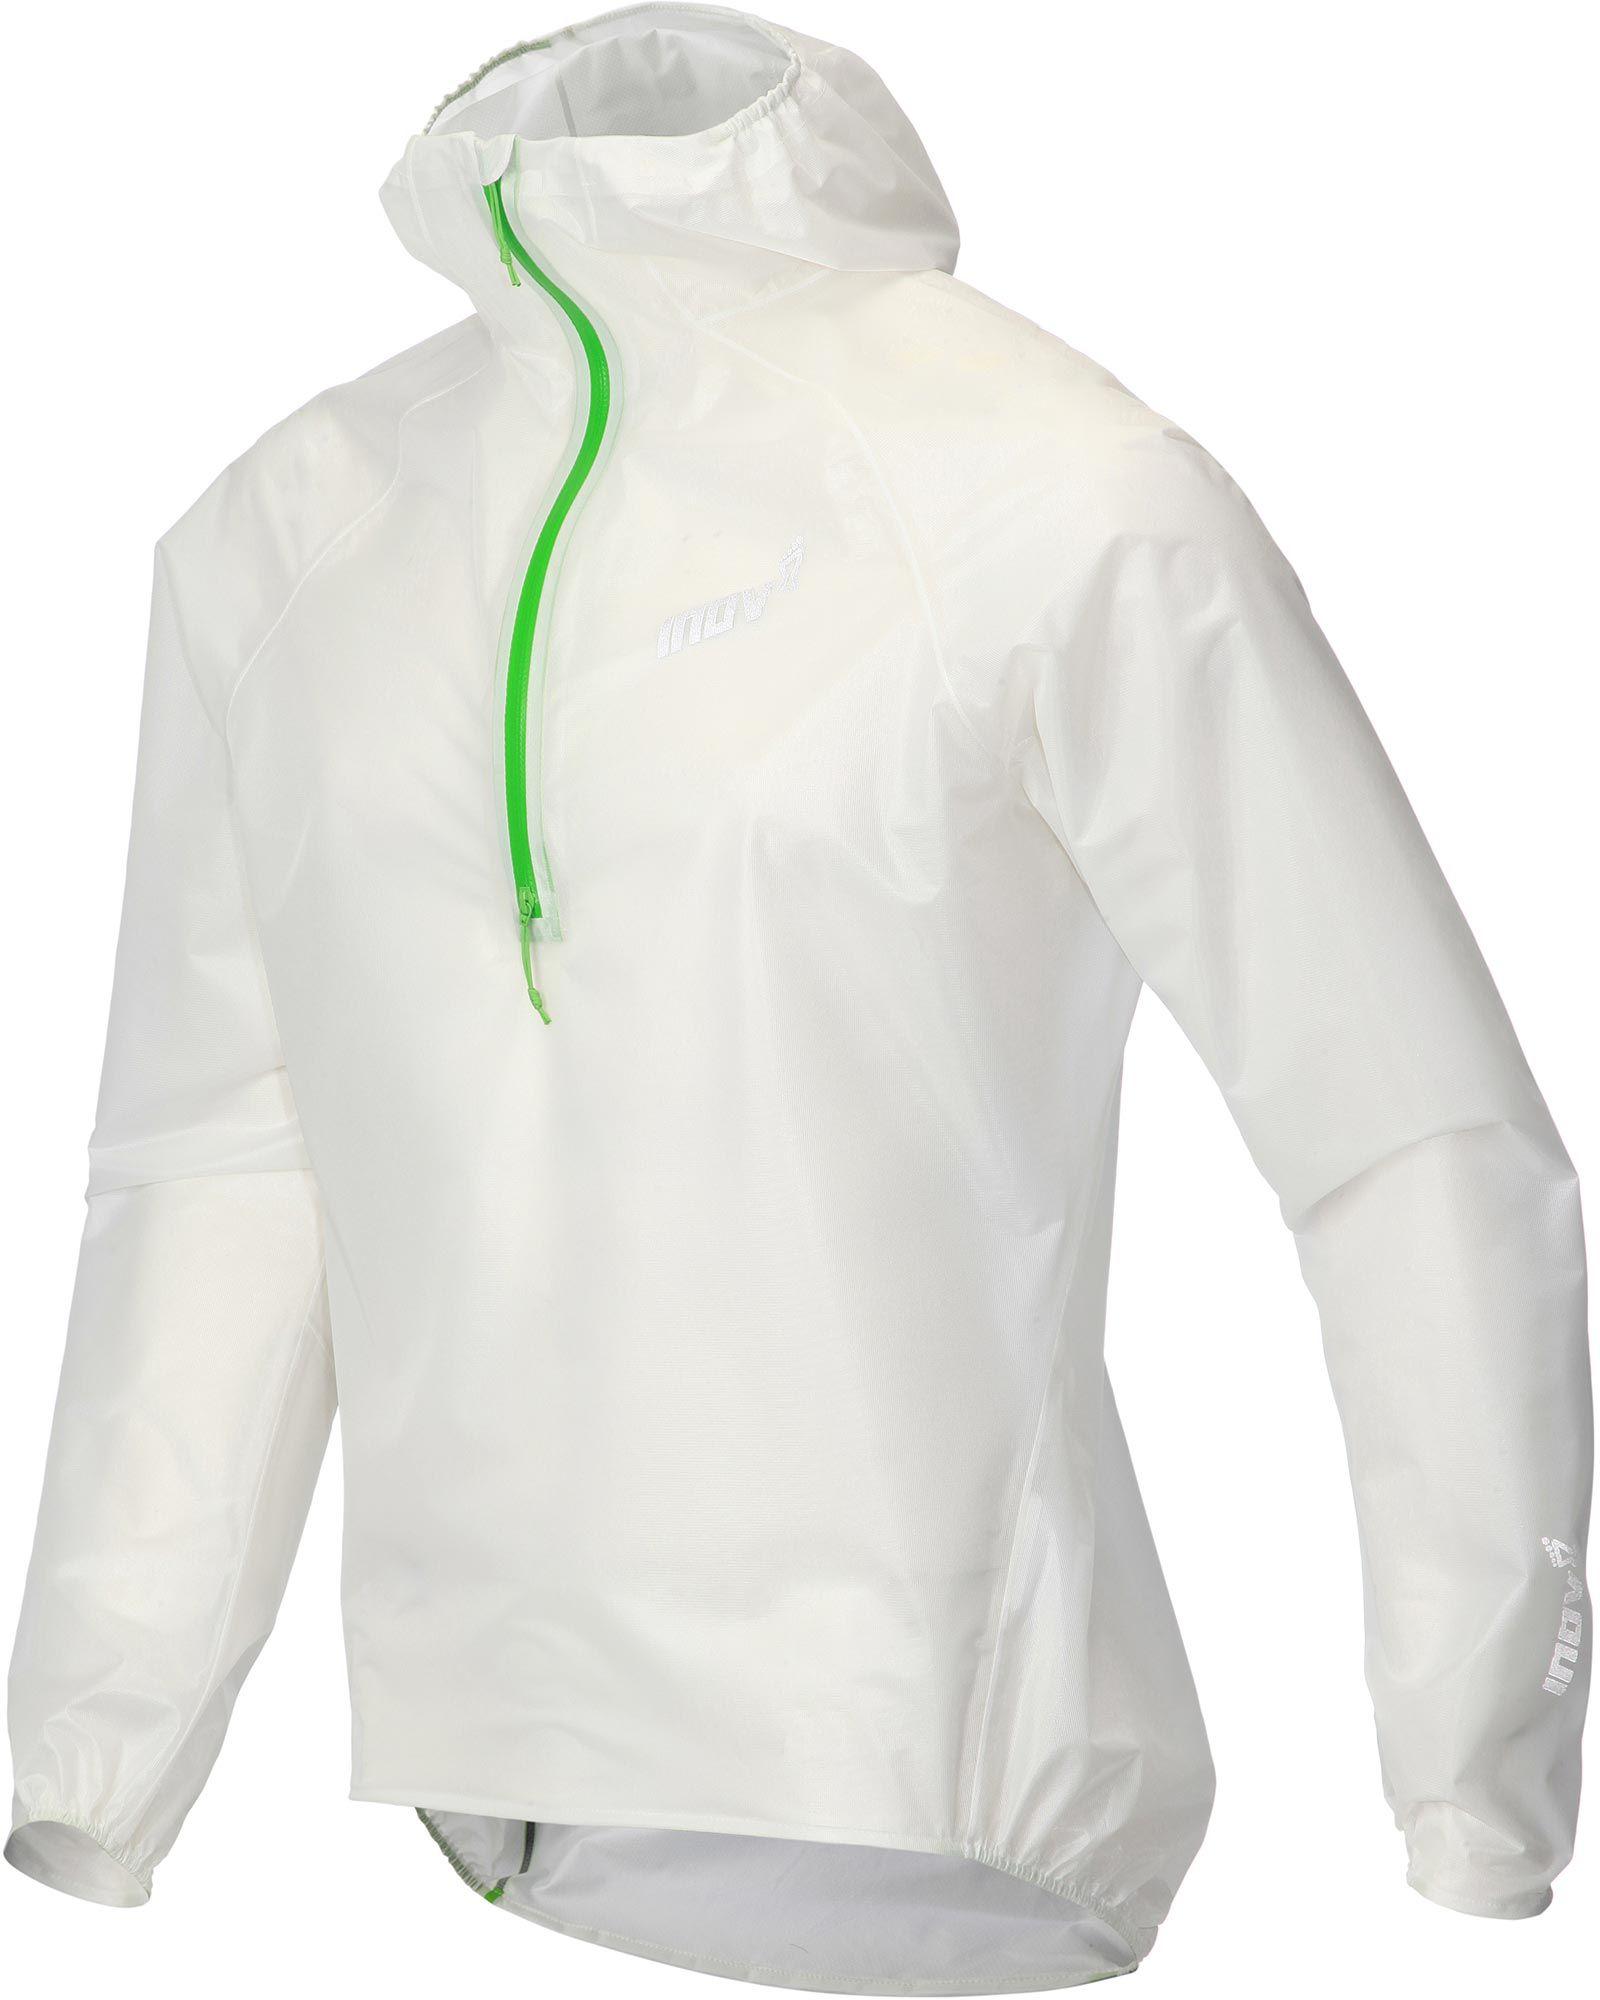 Inov8 Ultrashell Half Zip Jacket - Waterproof, Lightweight & Durable